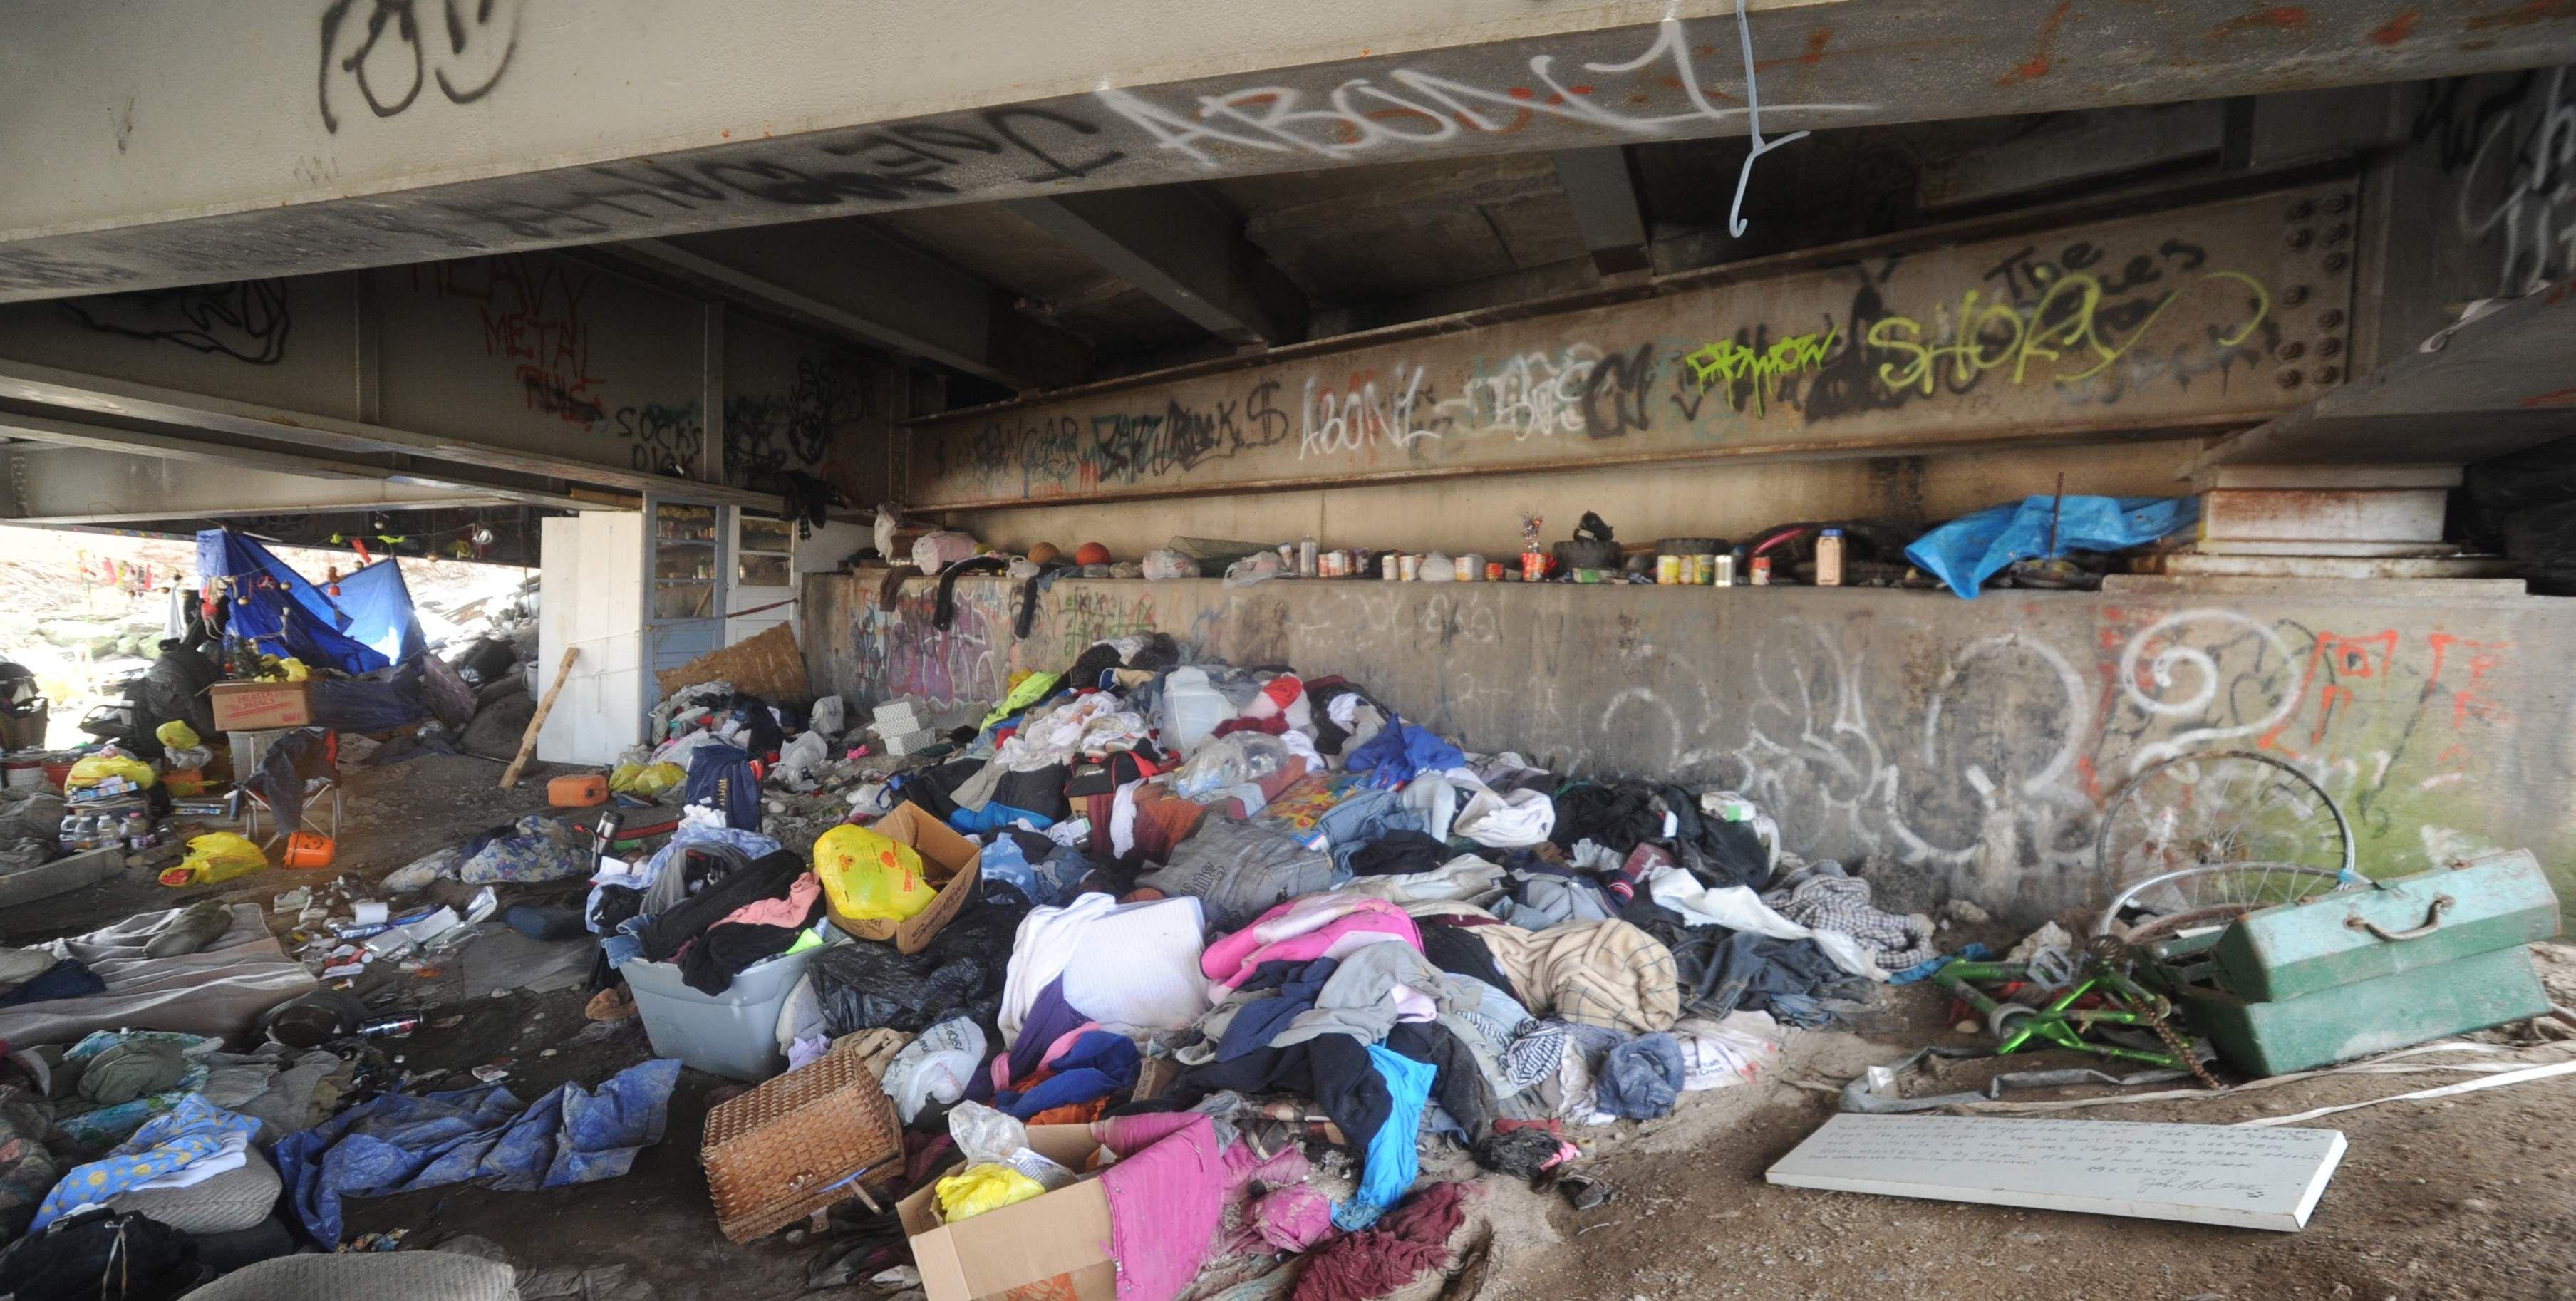 Monroe County S Homeless Through The Cracks And Under The Bridge Under Bridge Homeless Bridge Art